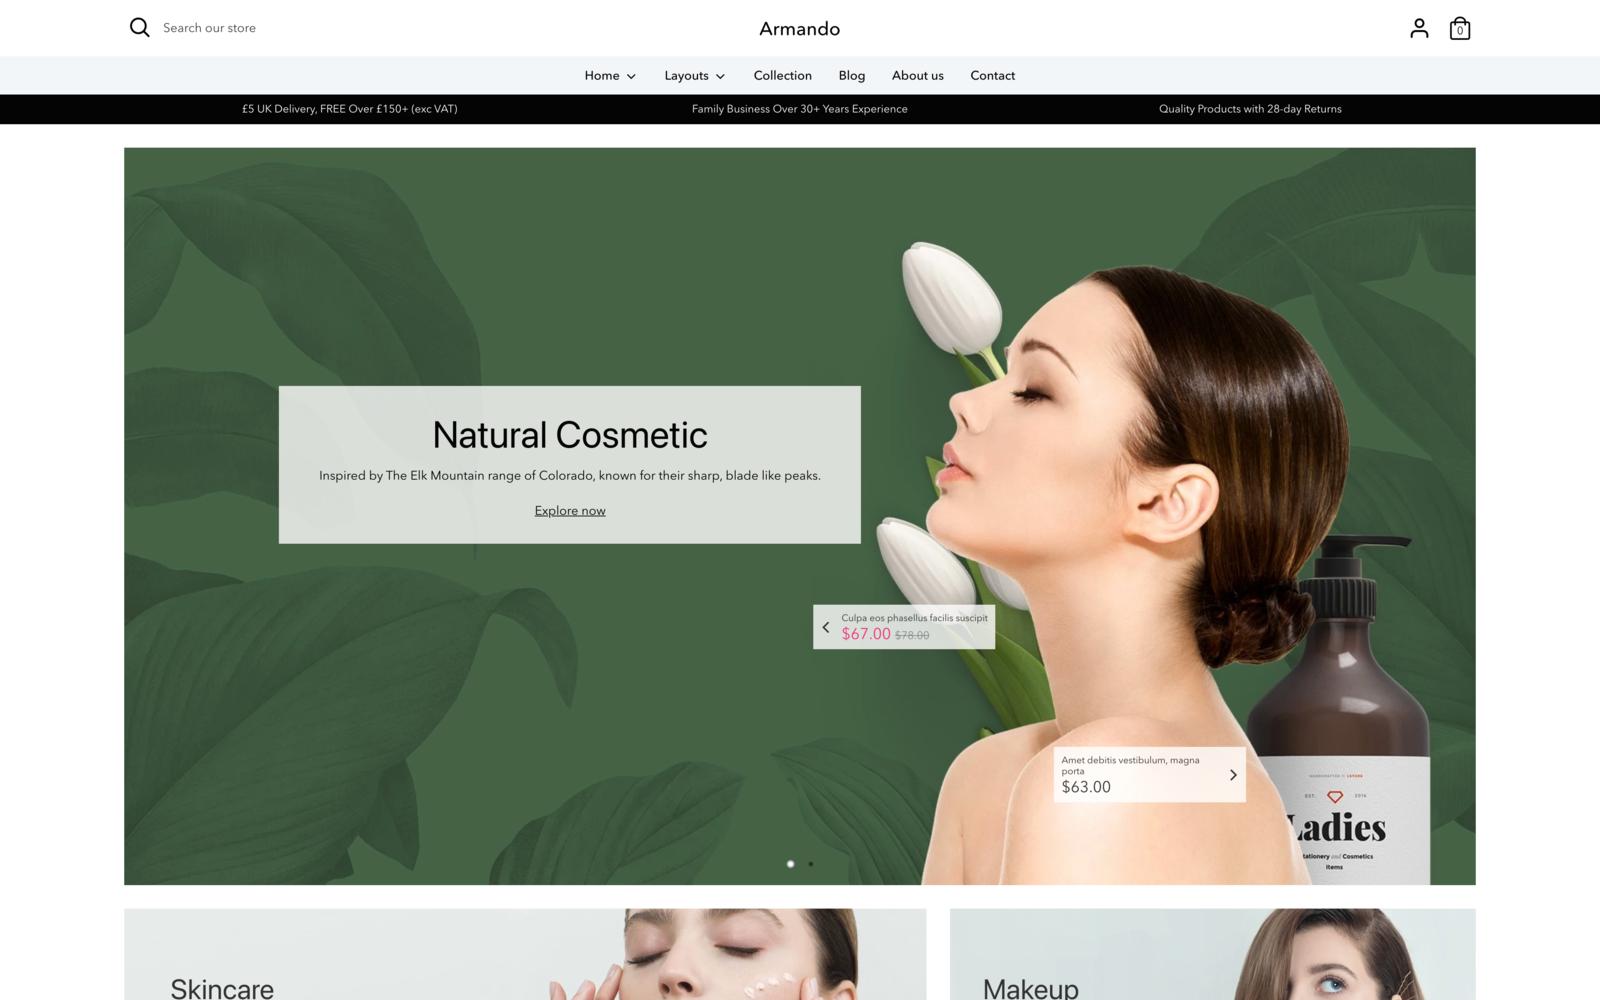 Armando - Beauty and Cosmetics Shopify Theme